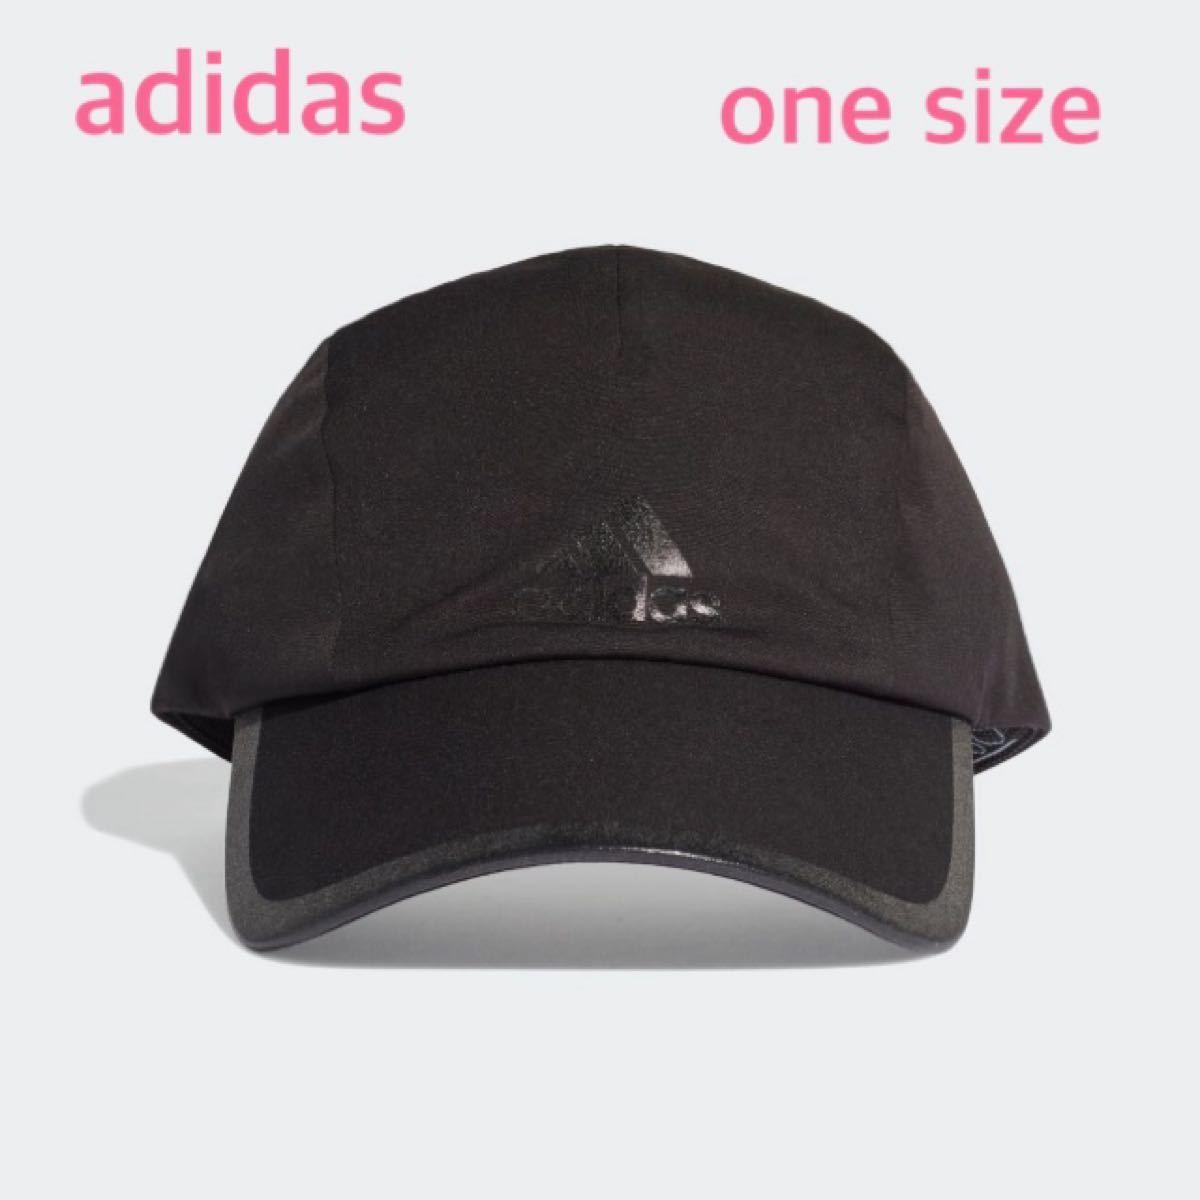 adidas アディダス ランニングキャップ UVカット ブラック レディース